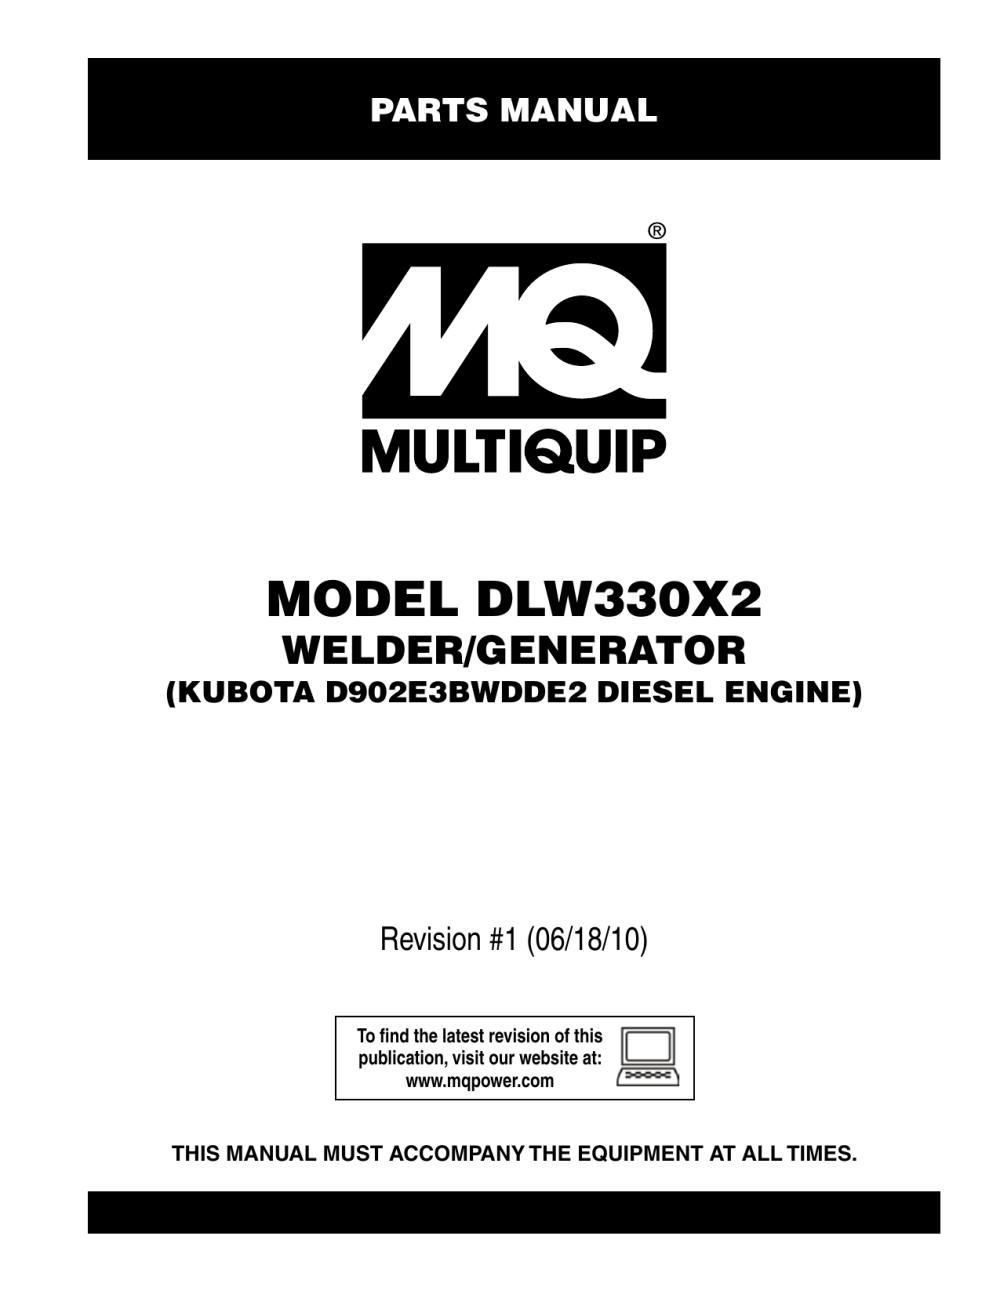 medium resolution of dlw330x2 rev 1 parts multiquip service support center